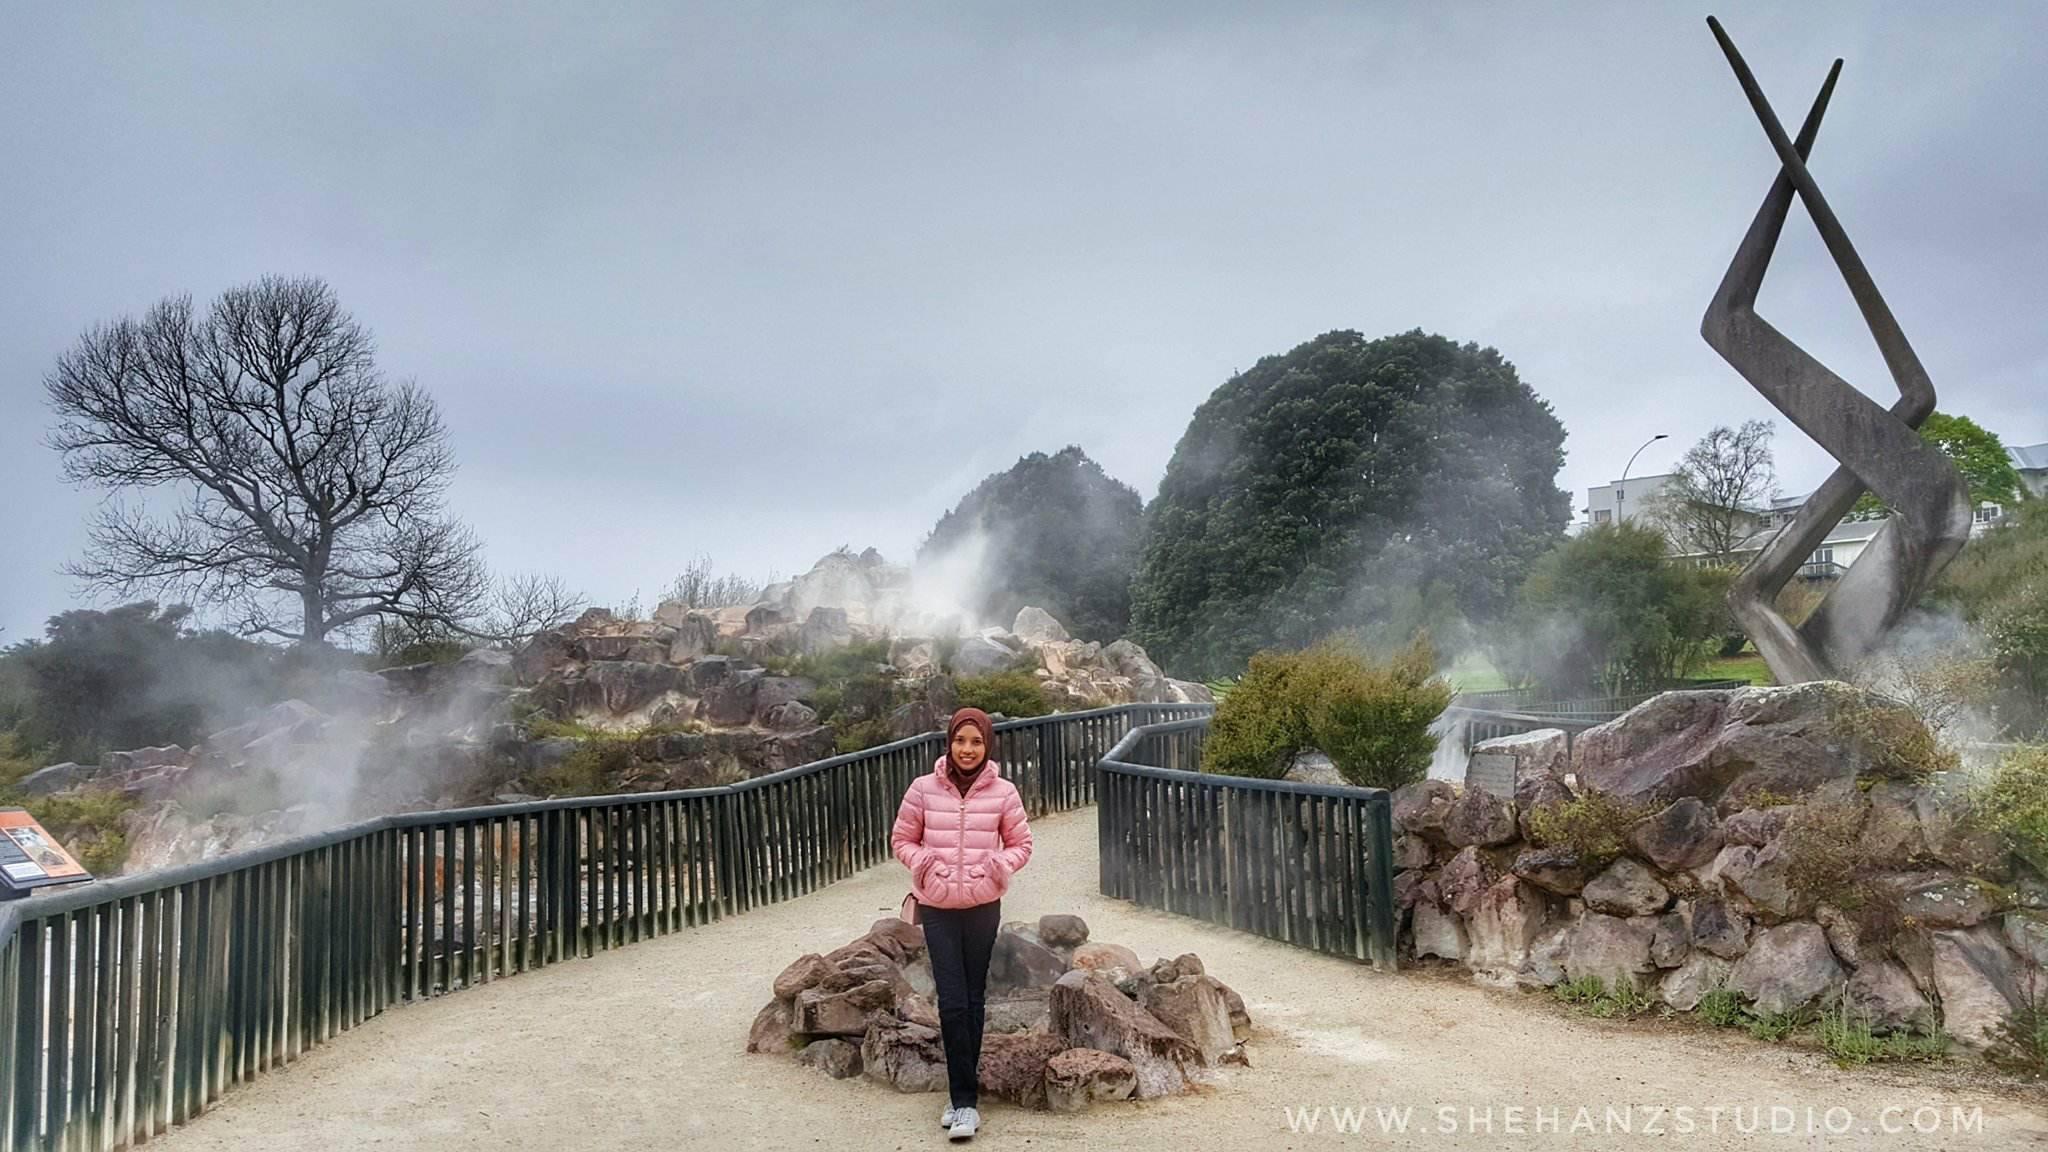 KEMBARA #KBBA9 COSMODERM - IKHLAS TOURS KE NEW ZEALAND BLUE LAKE, TARAWERA, AGRODOME AT ROTORUA (SPRING TIME) (PART 5) (10)